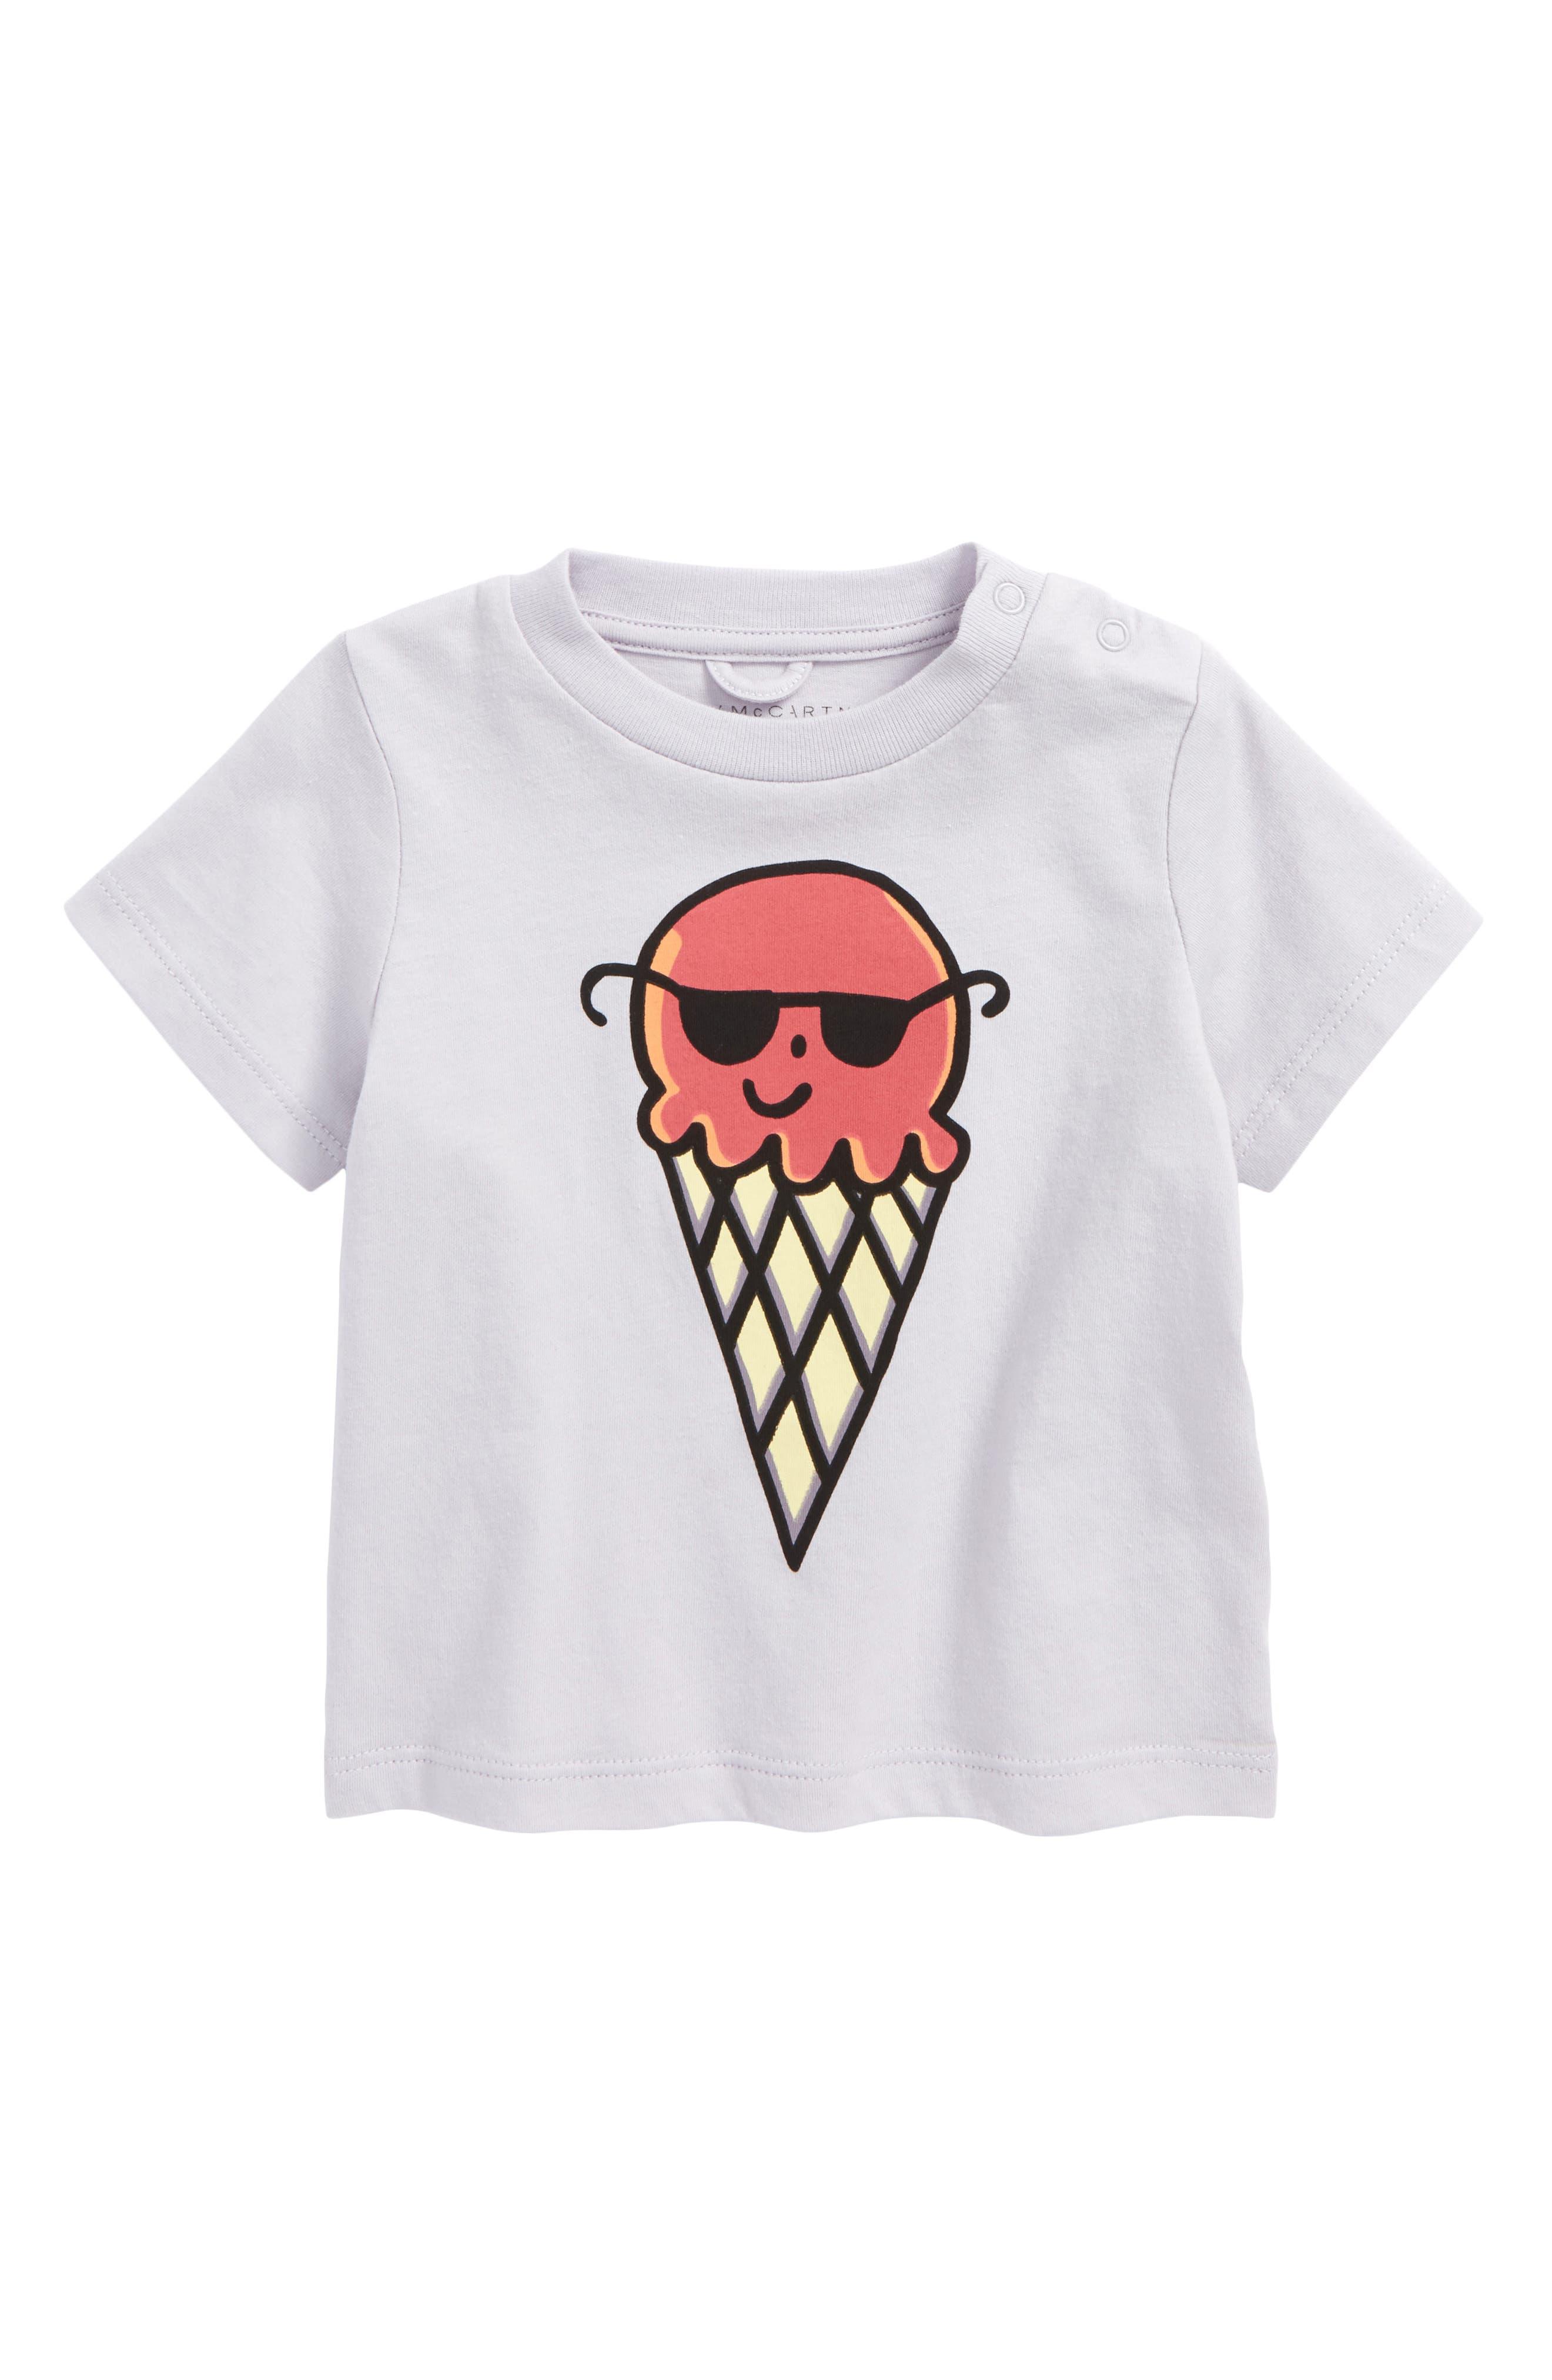 Chuckle Ice Cream Cone Tee,                             Main thumbnail 1, color,